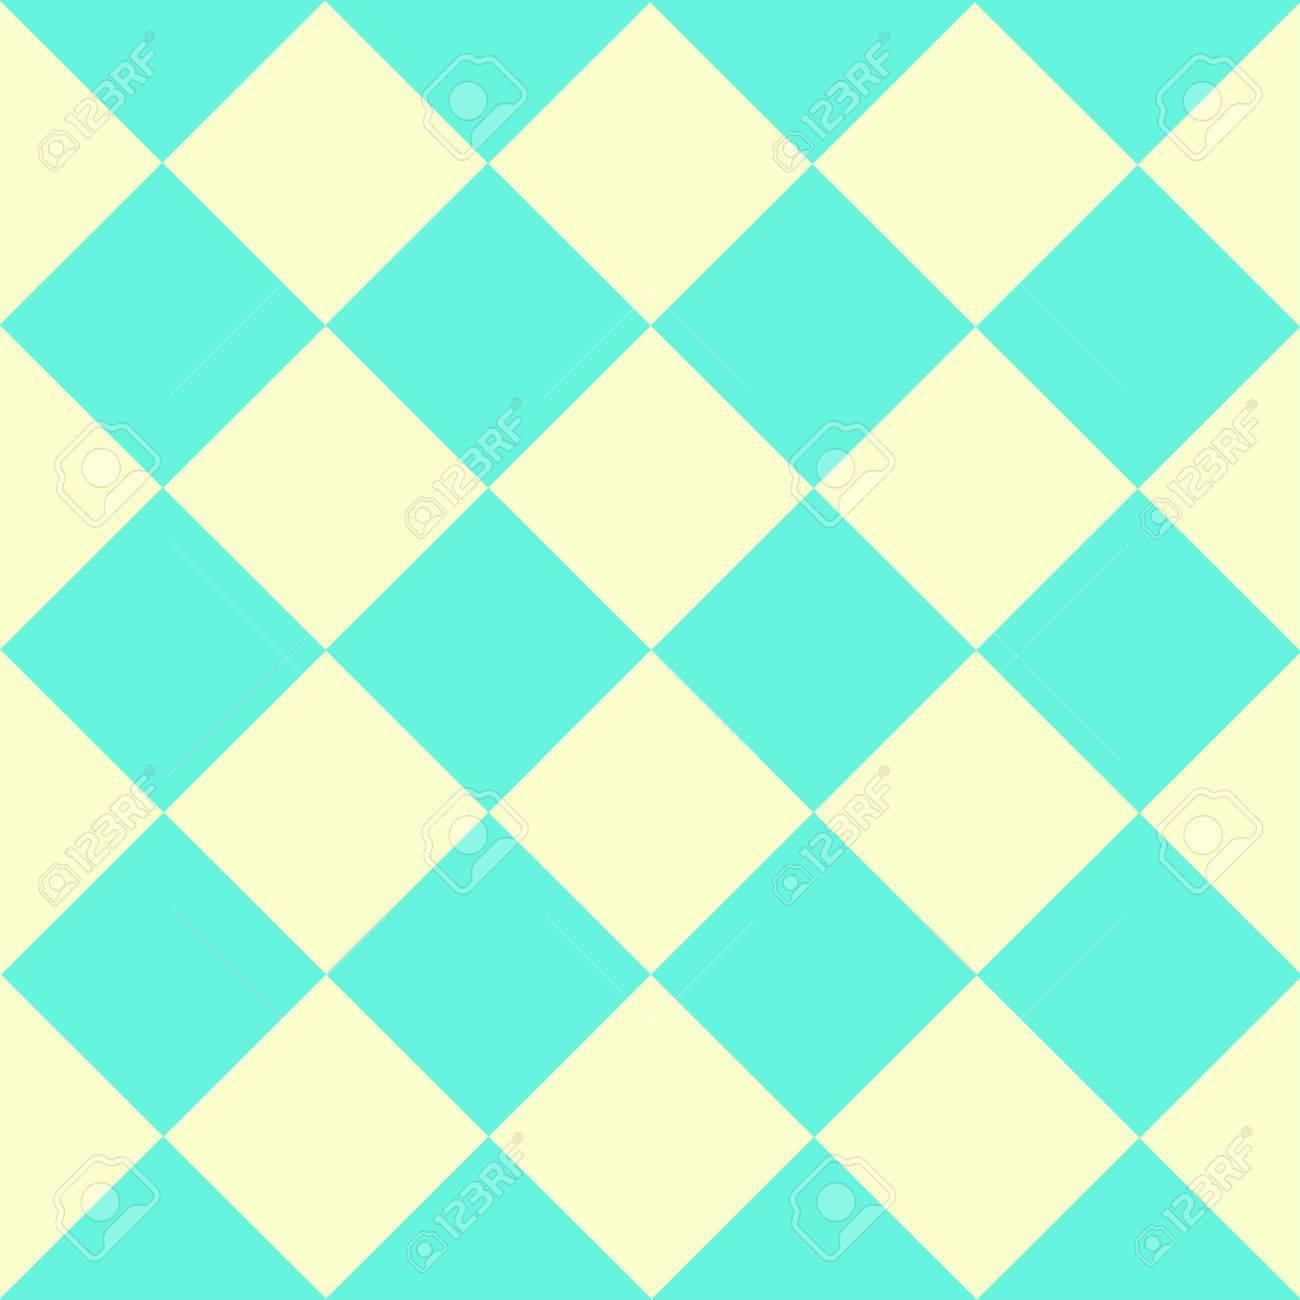 Green Yellow Chess Board Diamond Background Vector Illustration